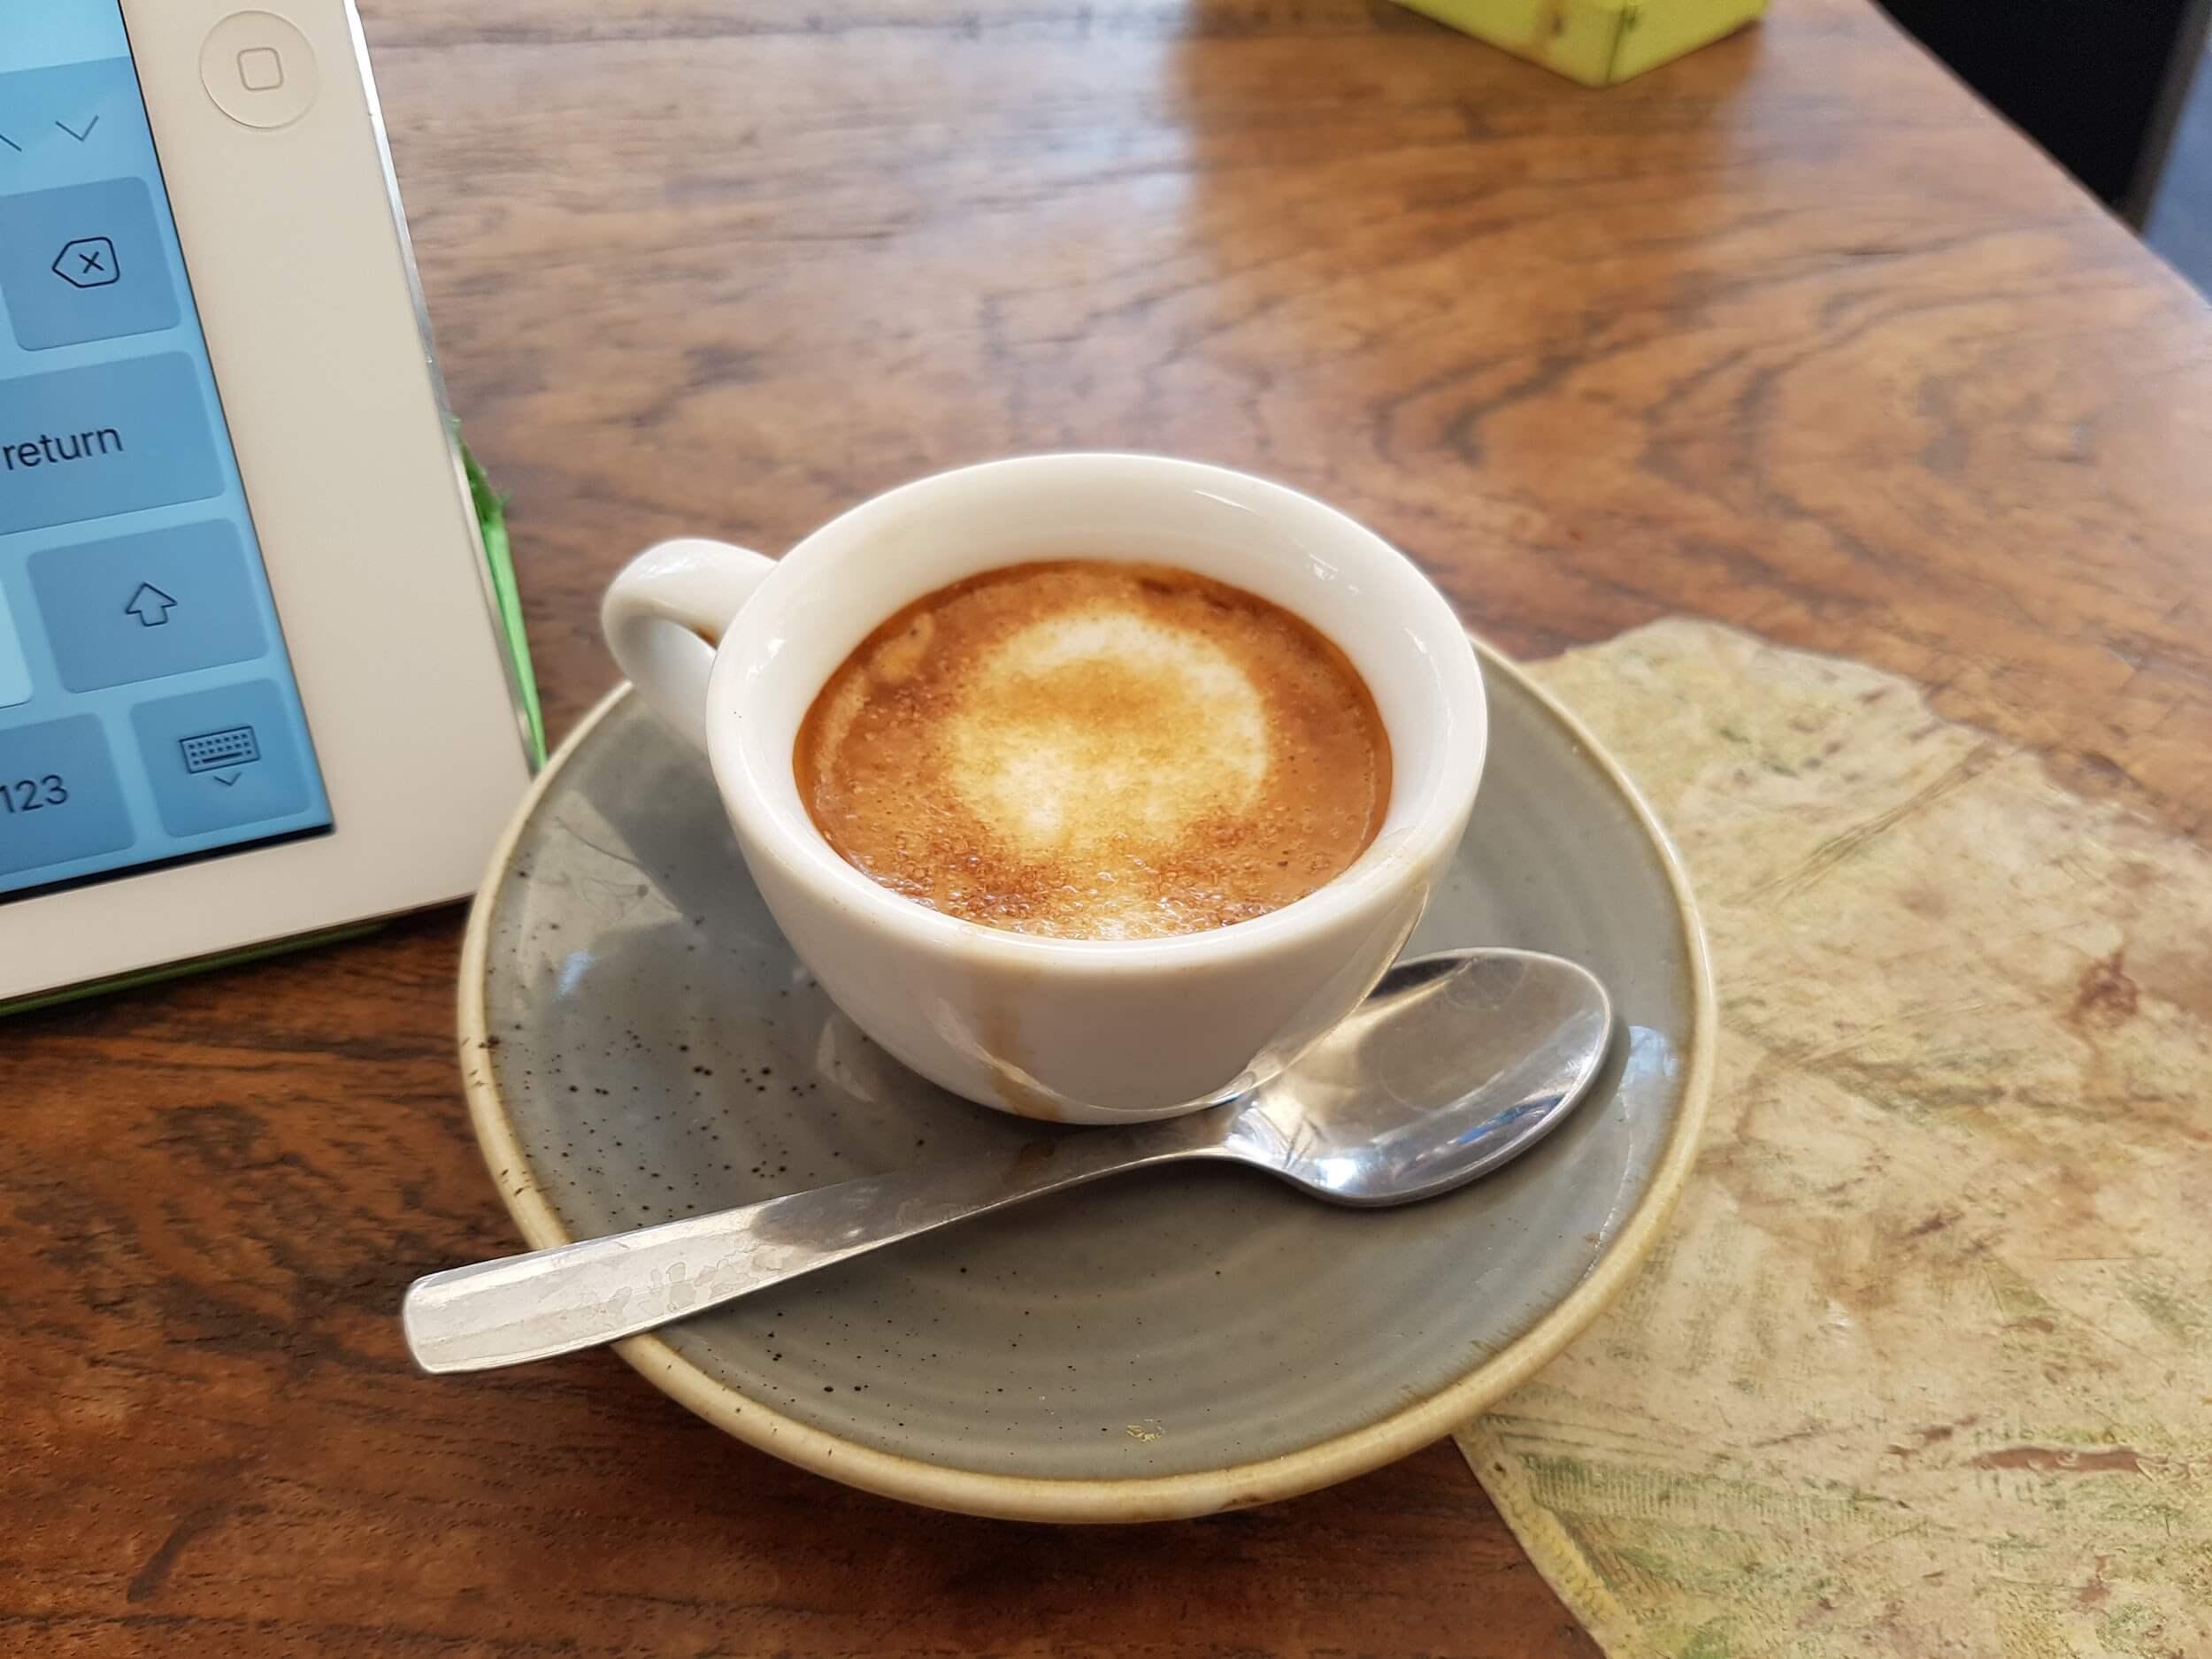 Espresso coffee on a table